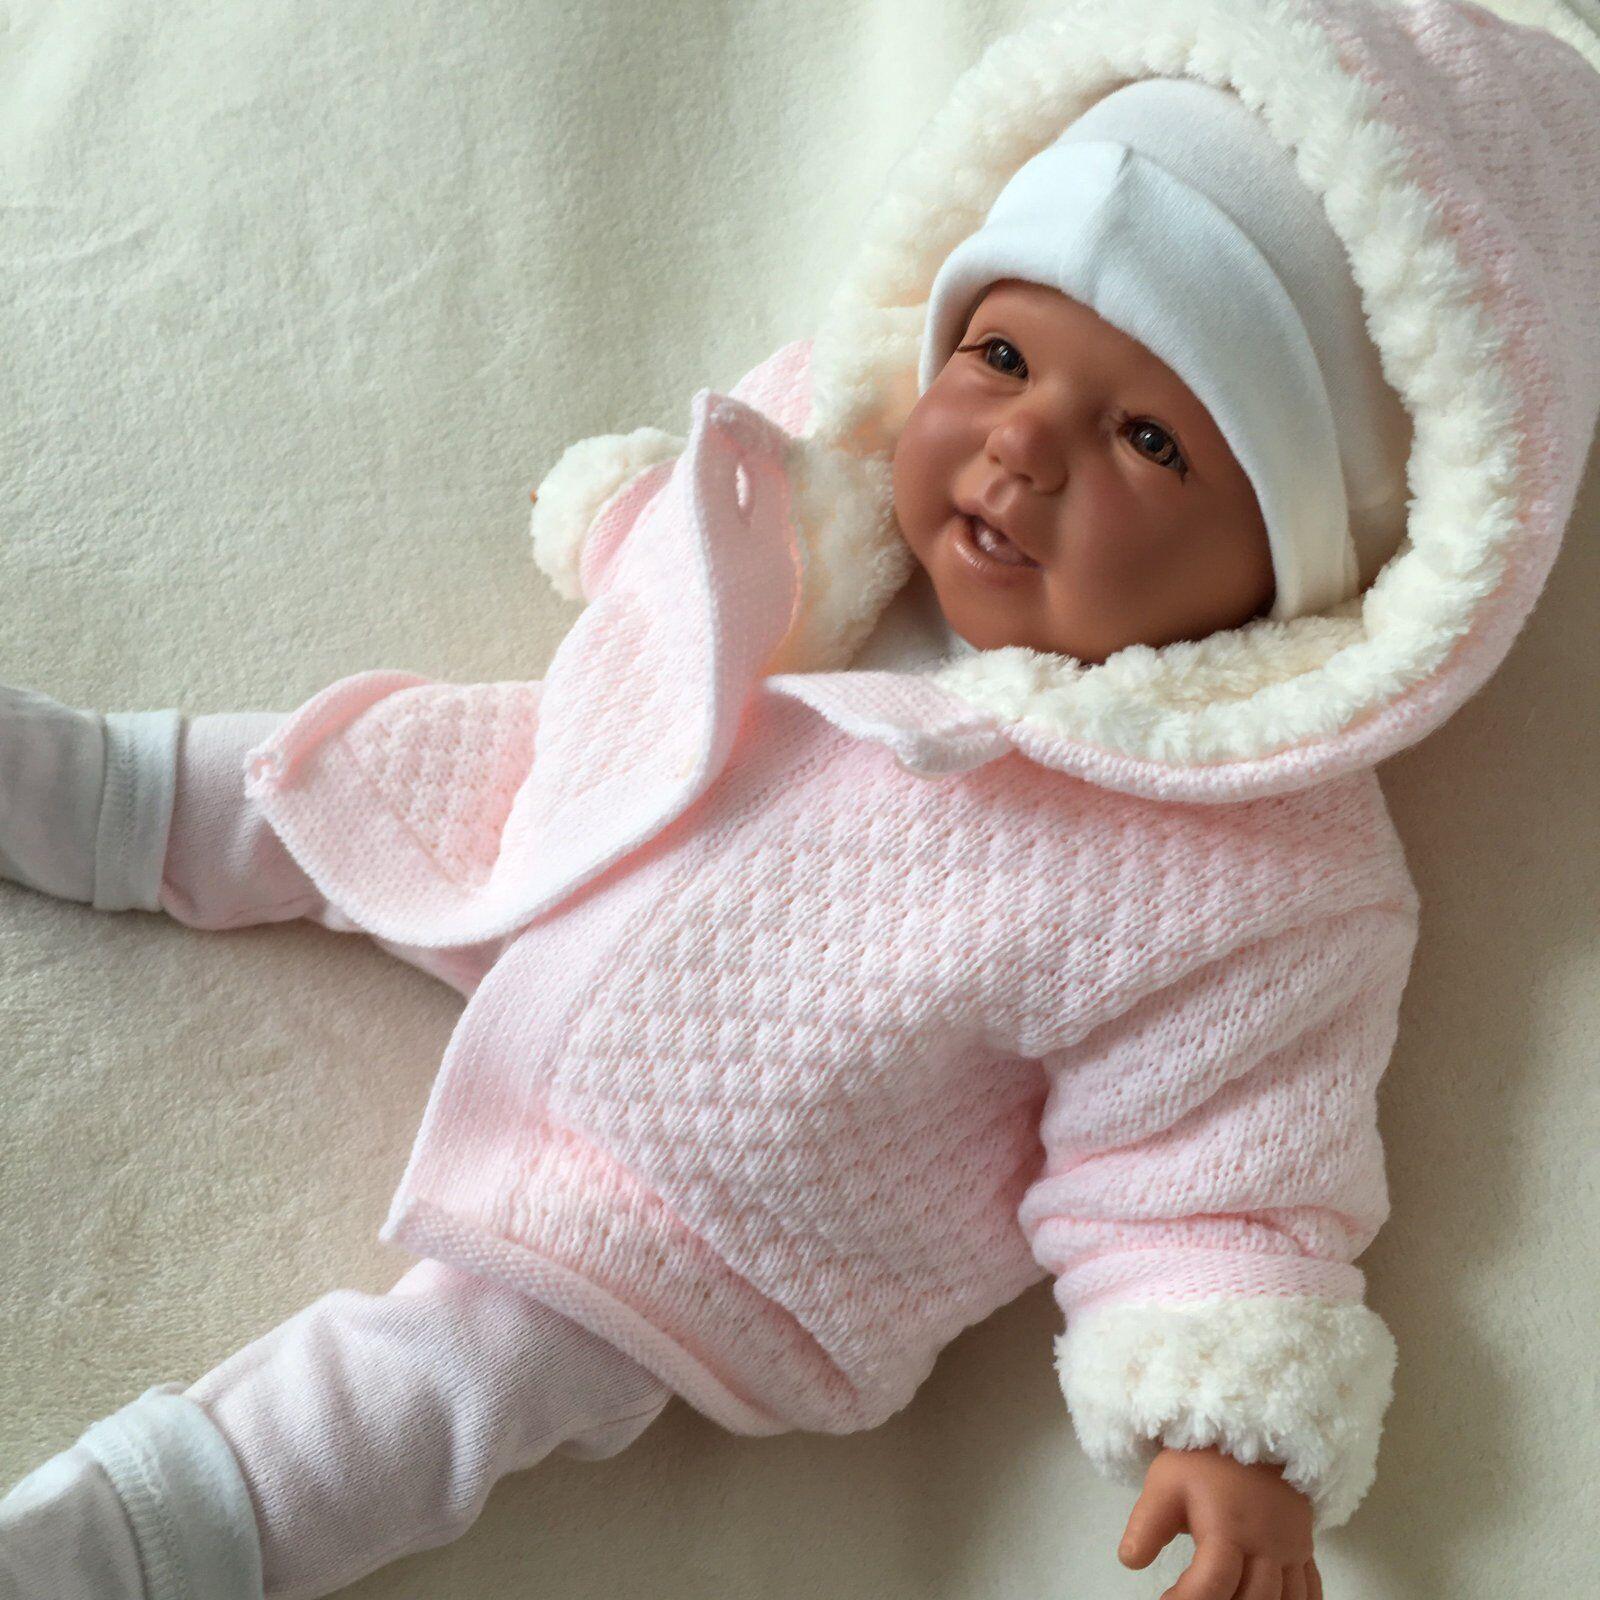 NEU Baby Mädchen Strickjacke Kapuzenjacke Cardigan Weste Gr. 62 68 74